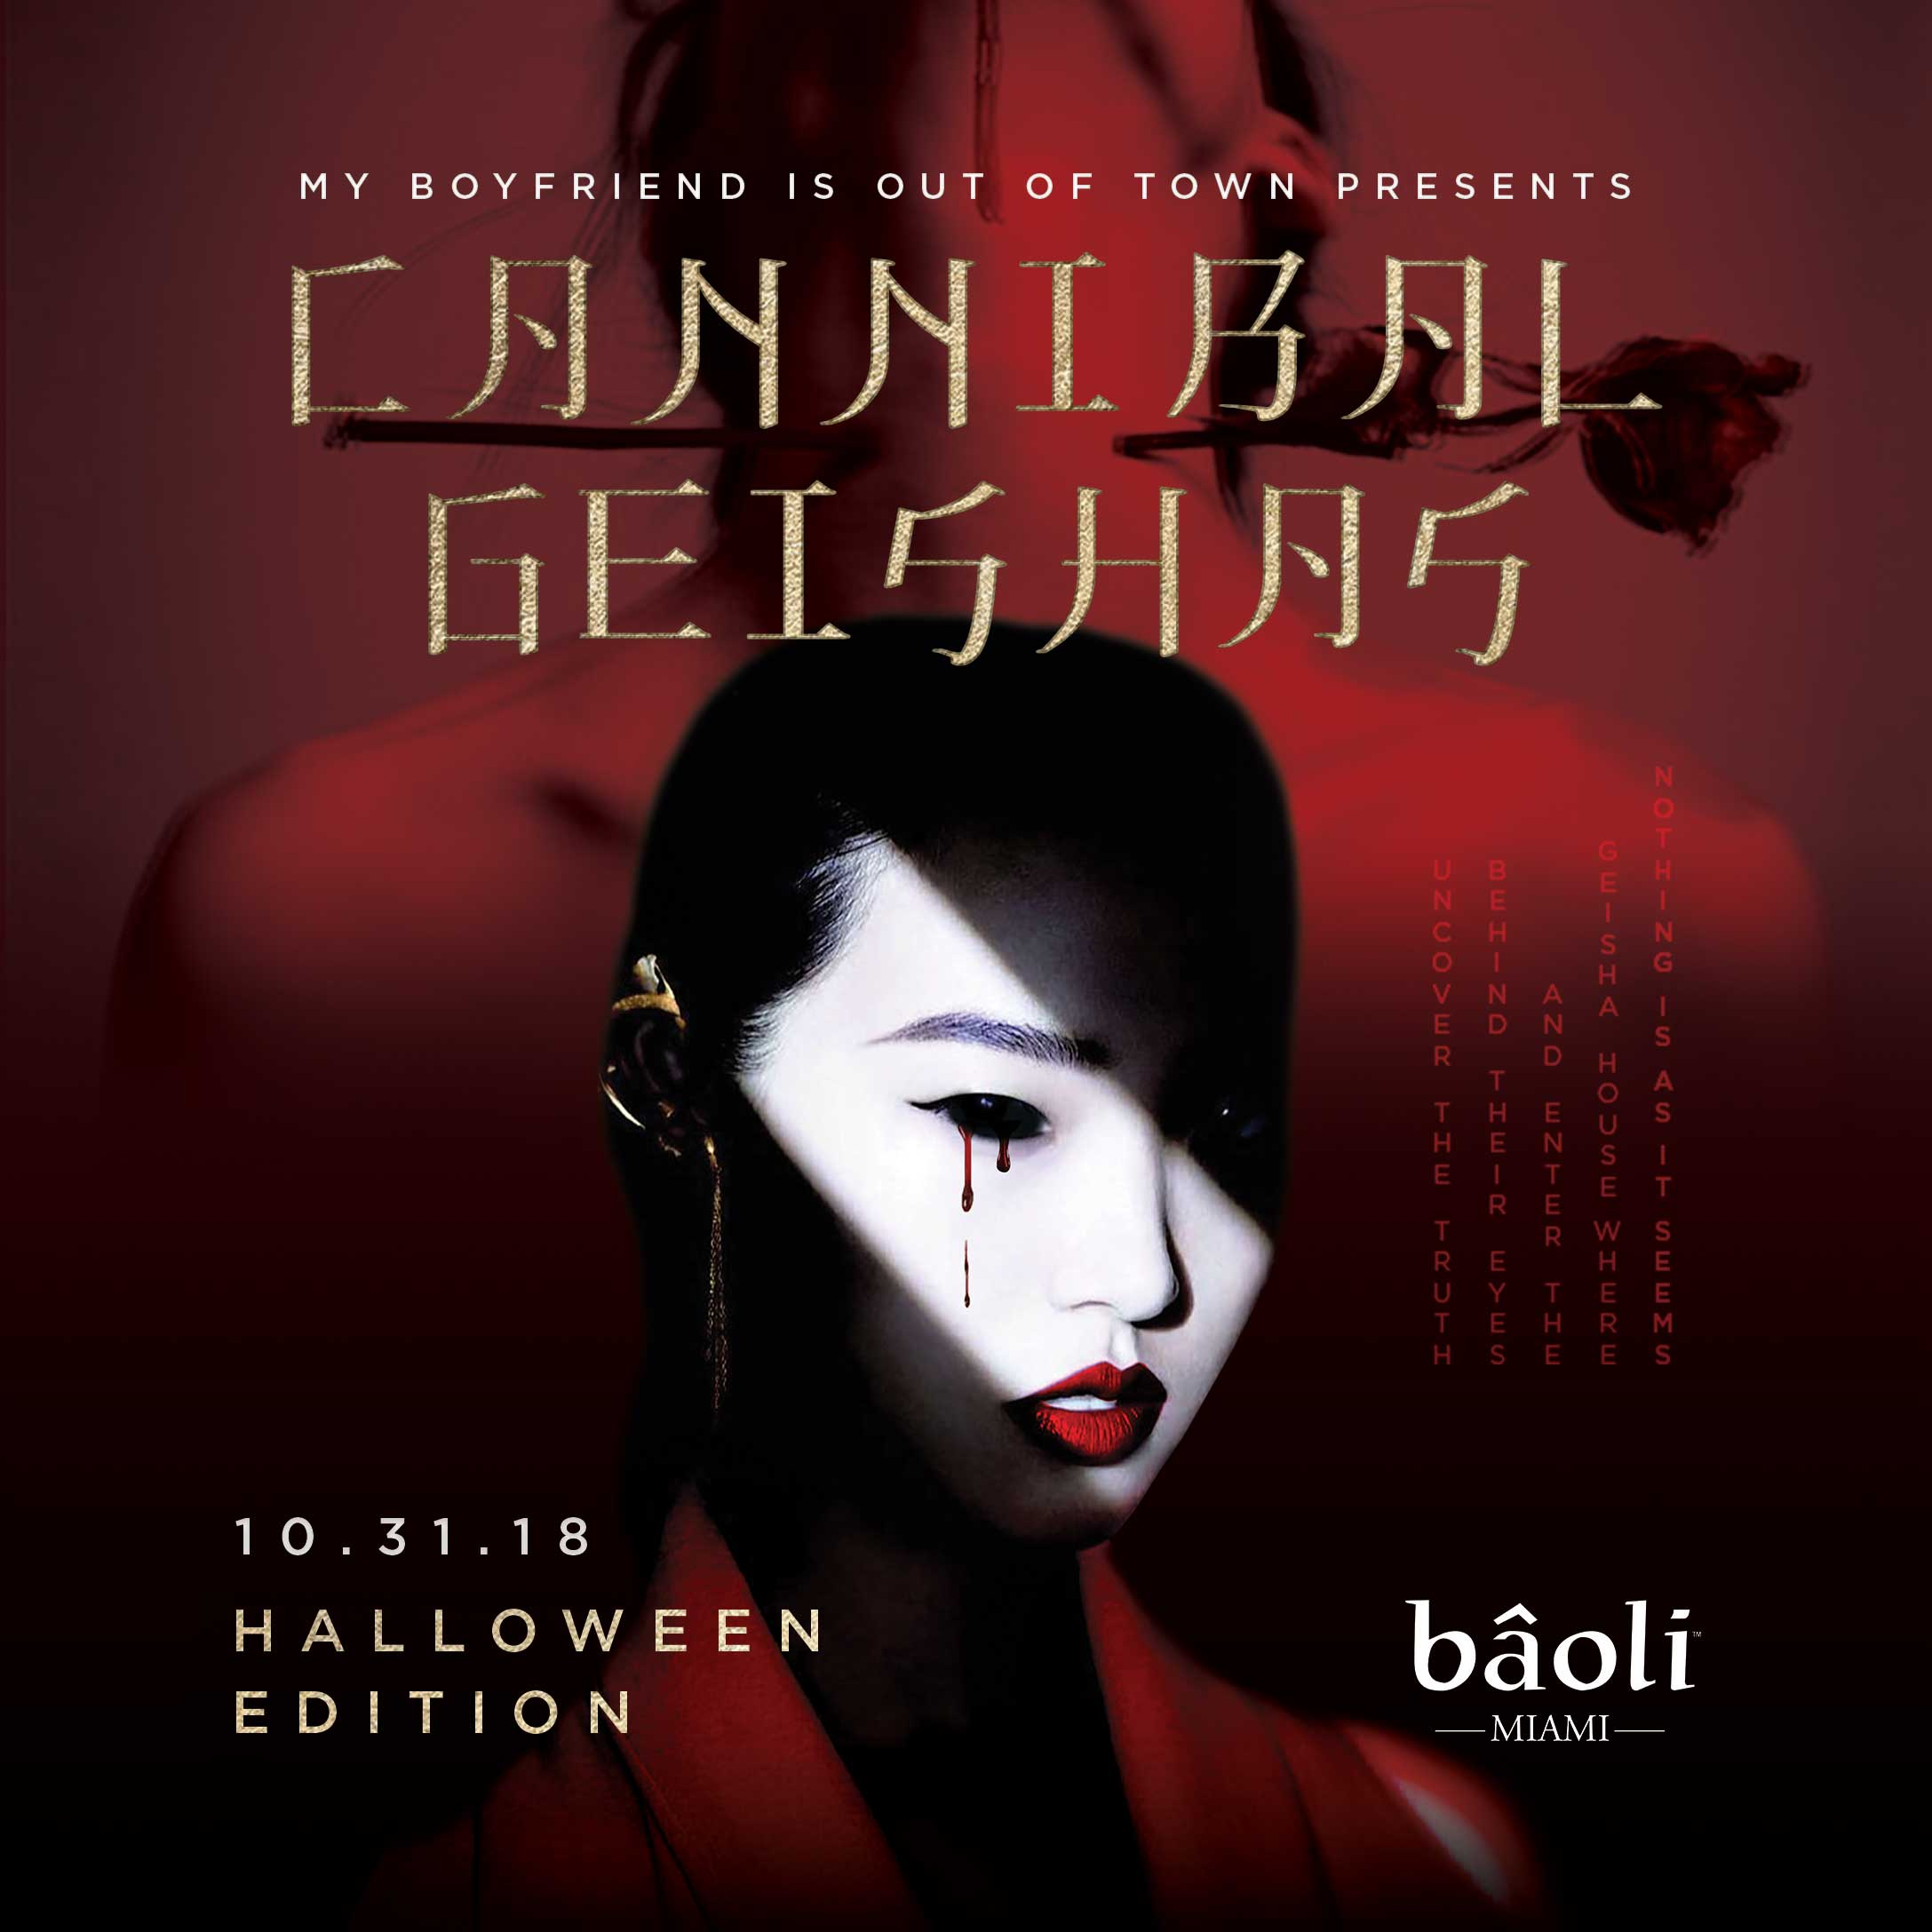 Cannibal-Geishas-Invite